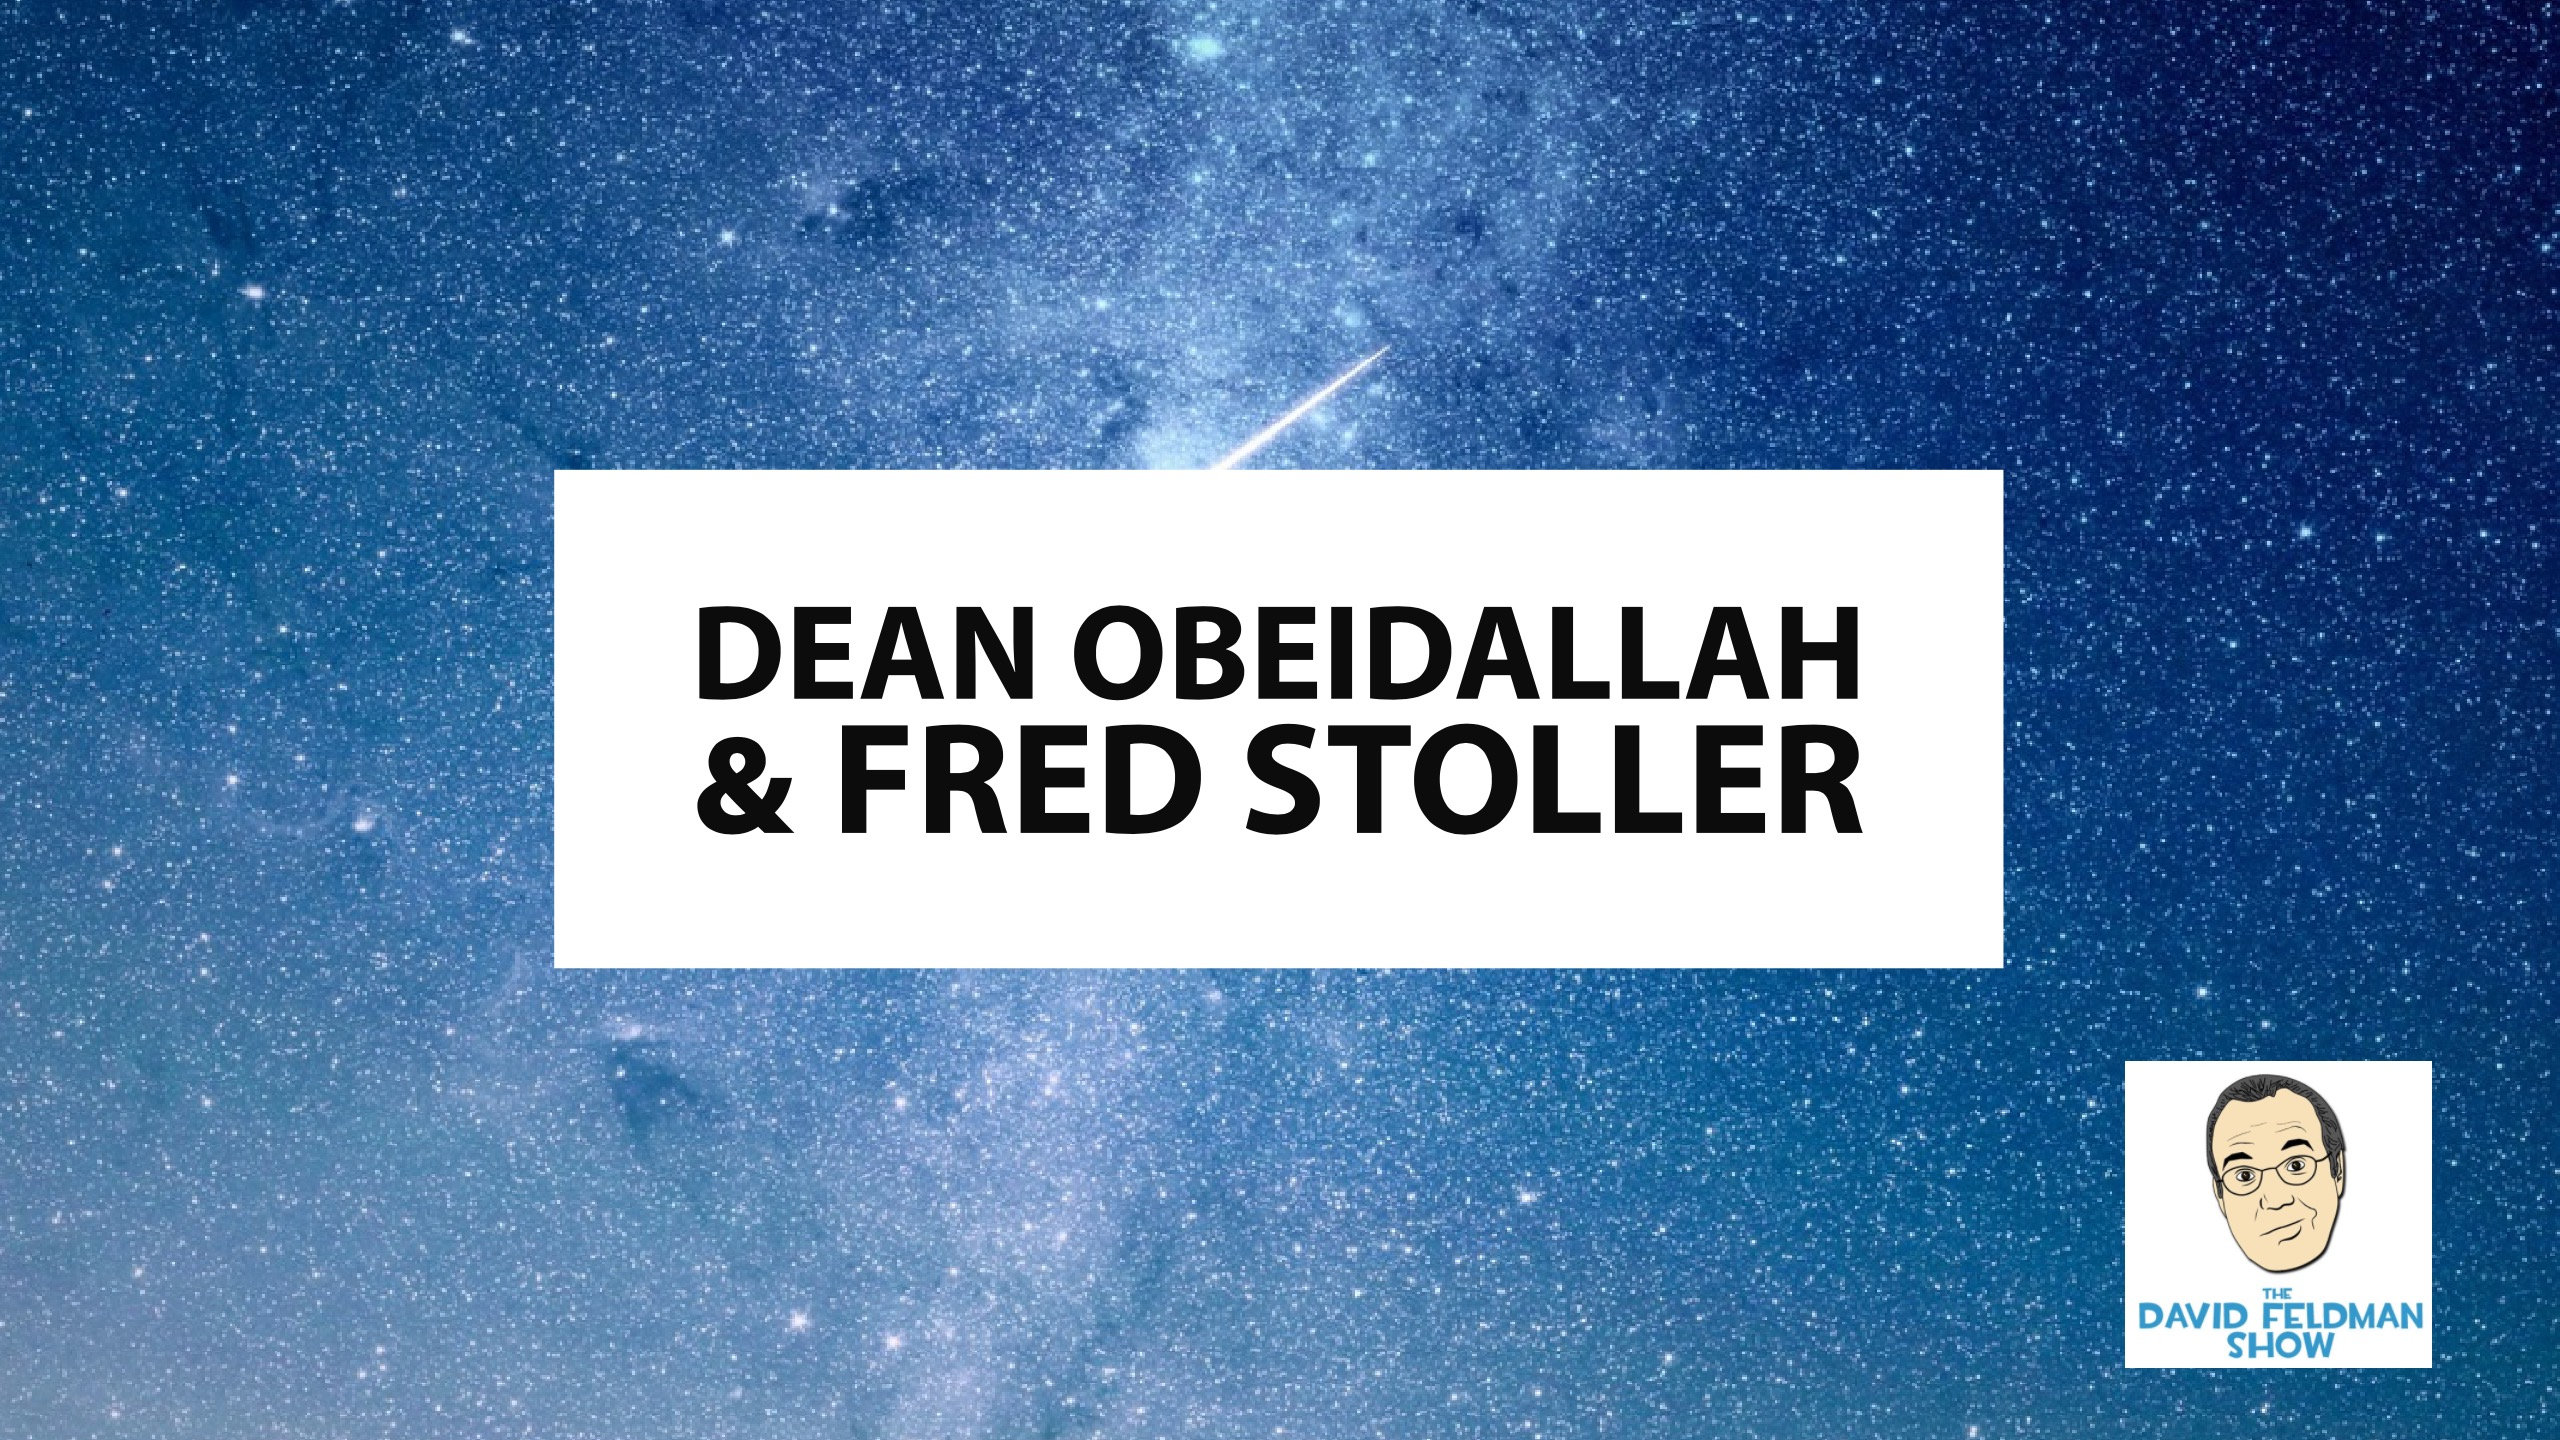 Comics Dean Obeidallah & Fred Stoller